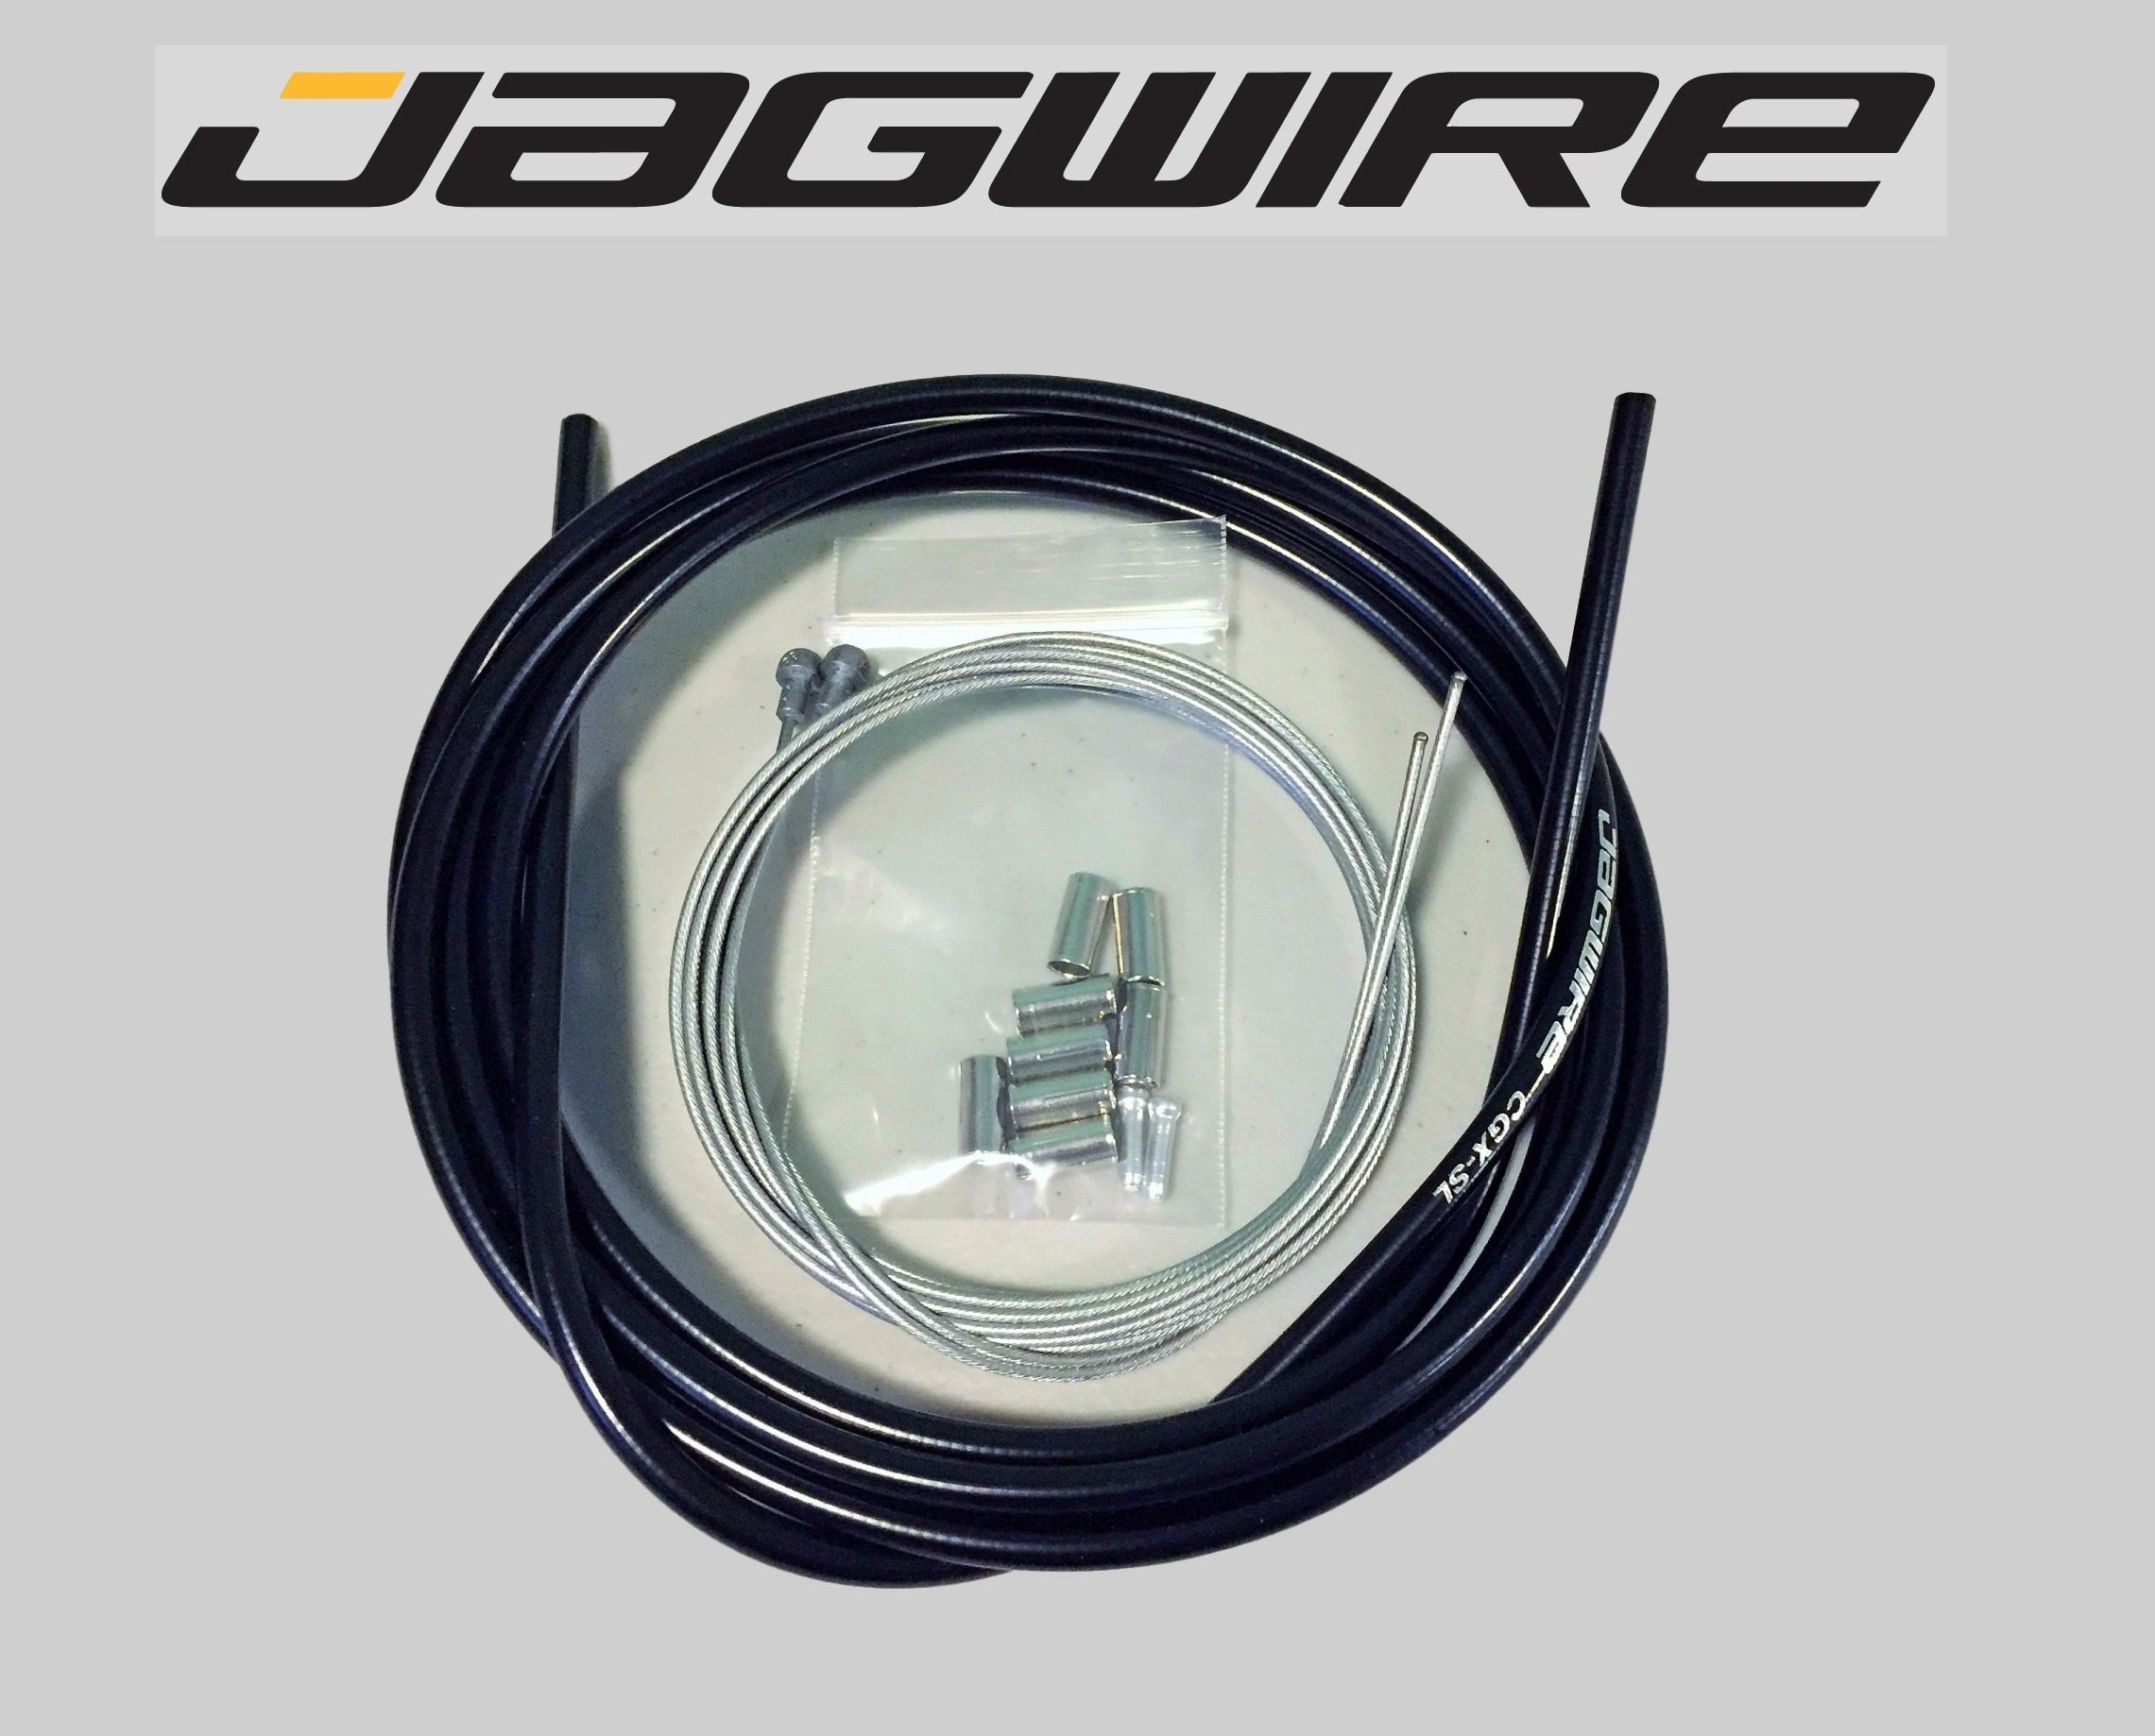 JAGWIRE ROAD Shop Kit - Brake Cable & Housing Kit - SRAM/Shimano